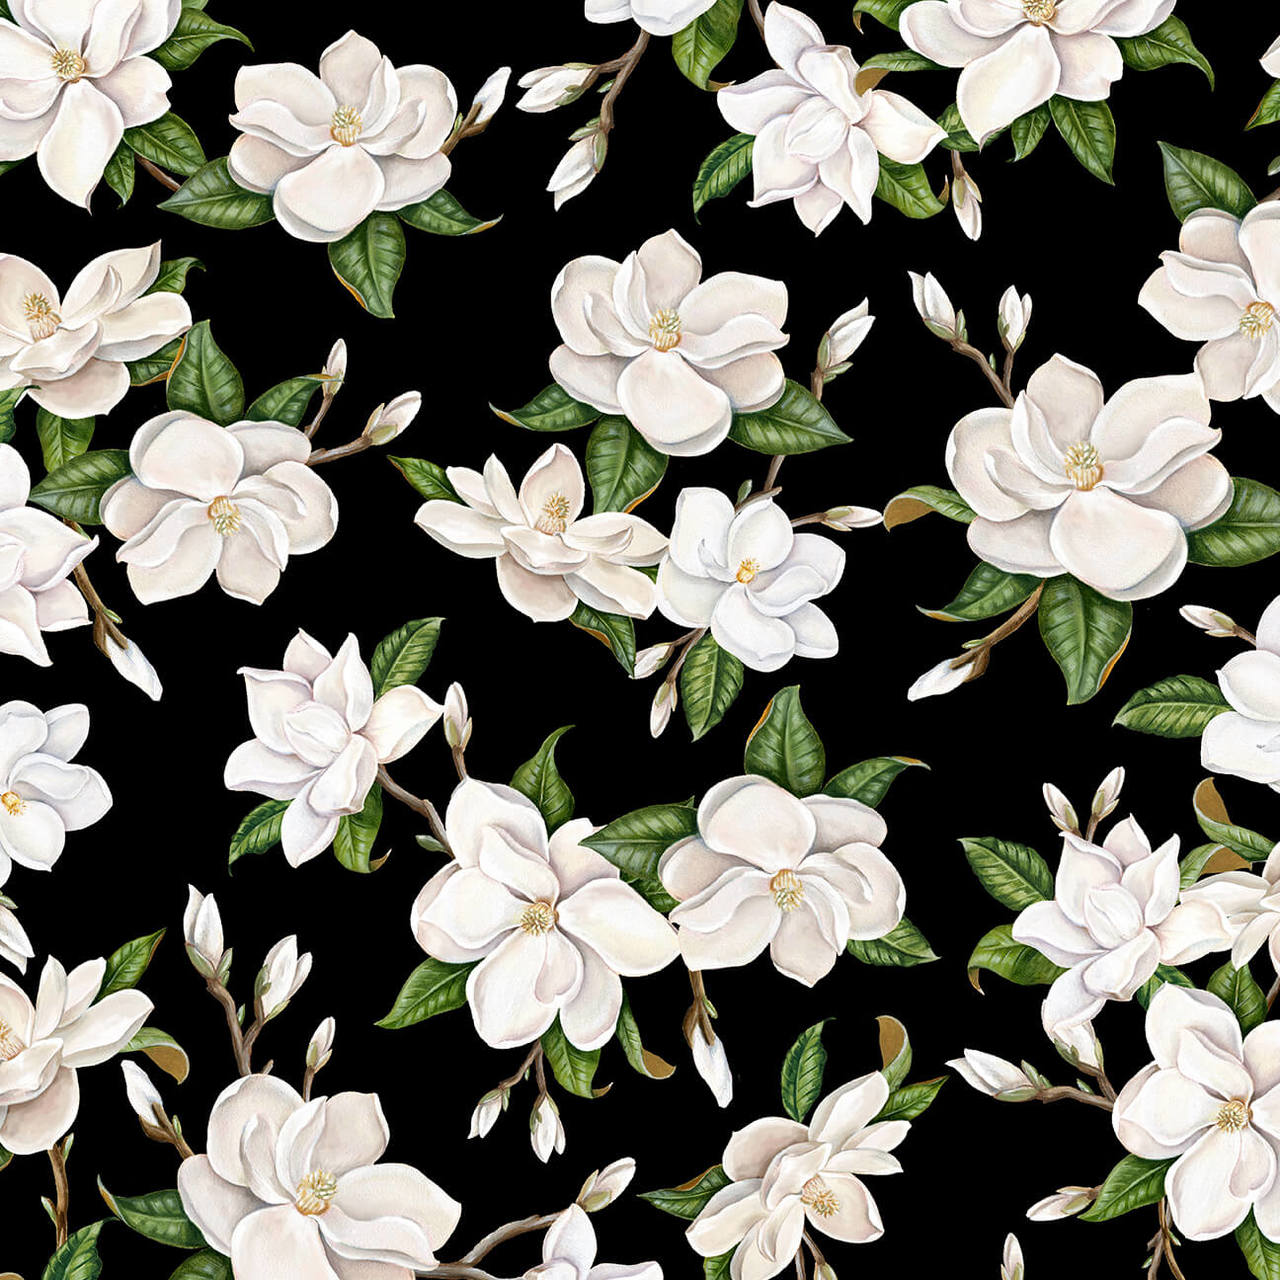 Large Magnolia 9844-99 Black